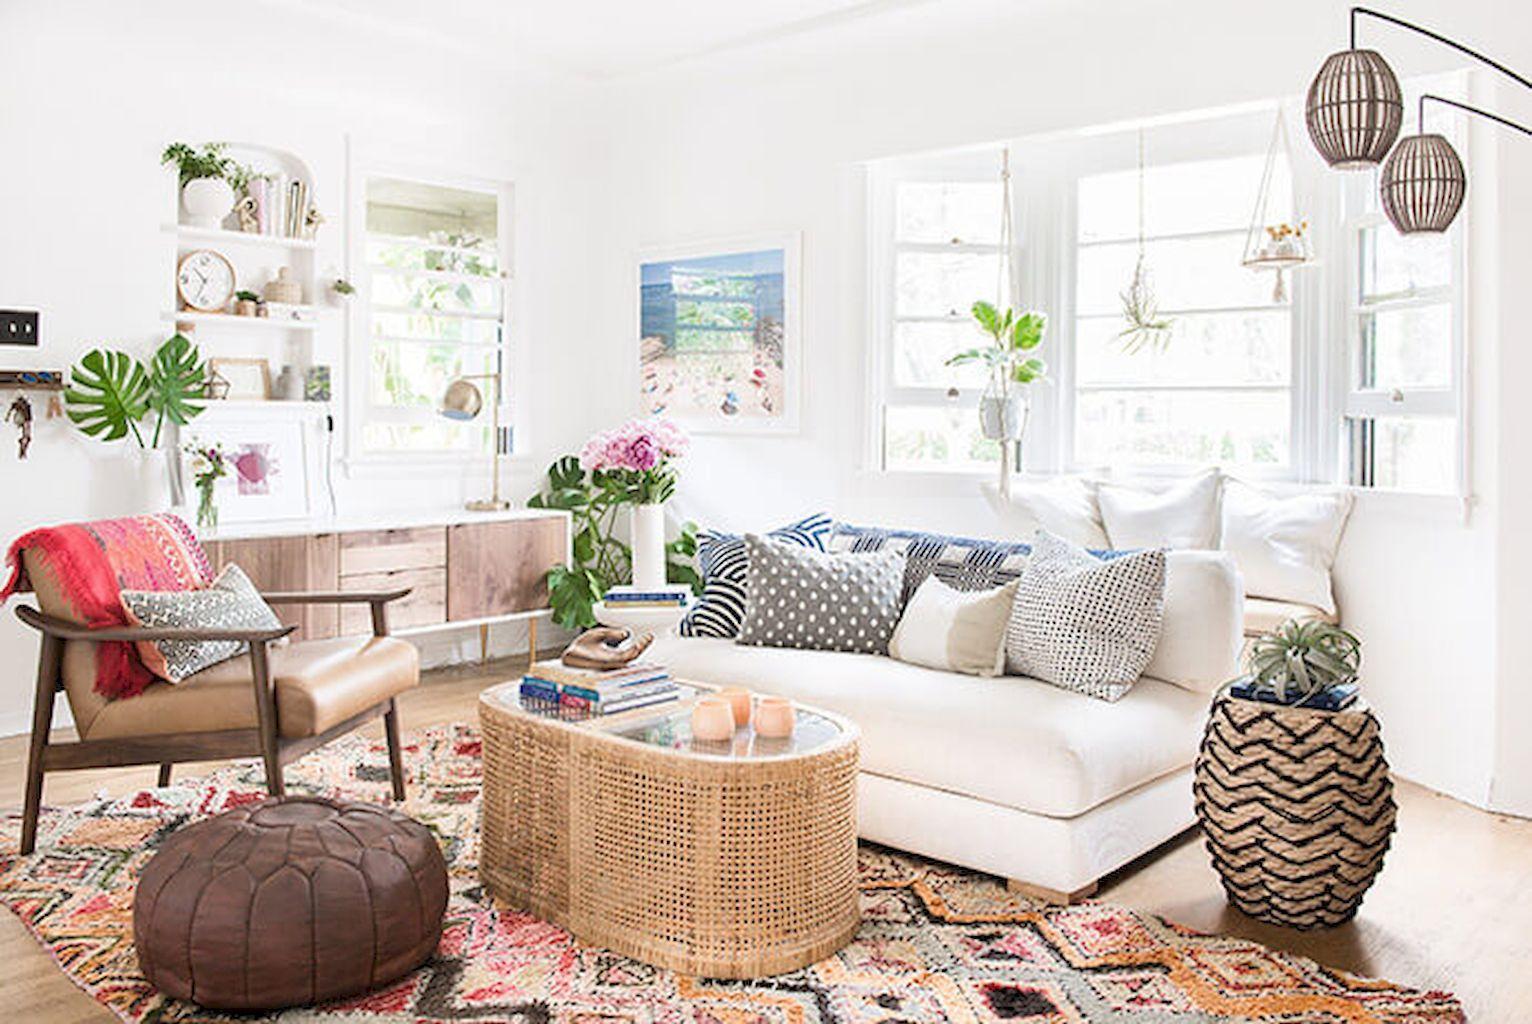 99 Stunning Boho Chic Living Room Decor Ideas On A Budget  Boho Fascinating Living Room Ideas On A Budget Design Decoration